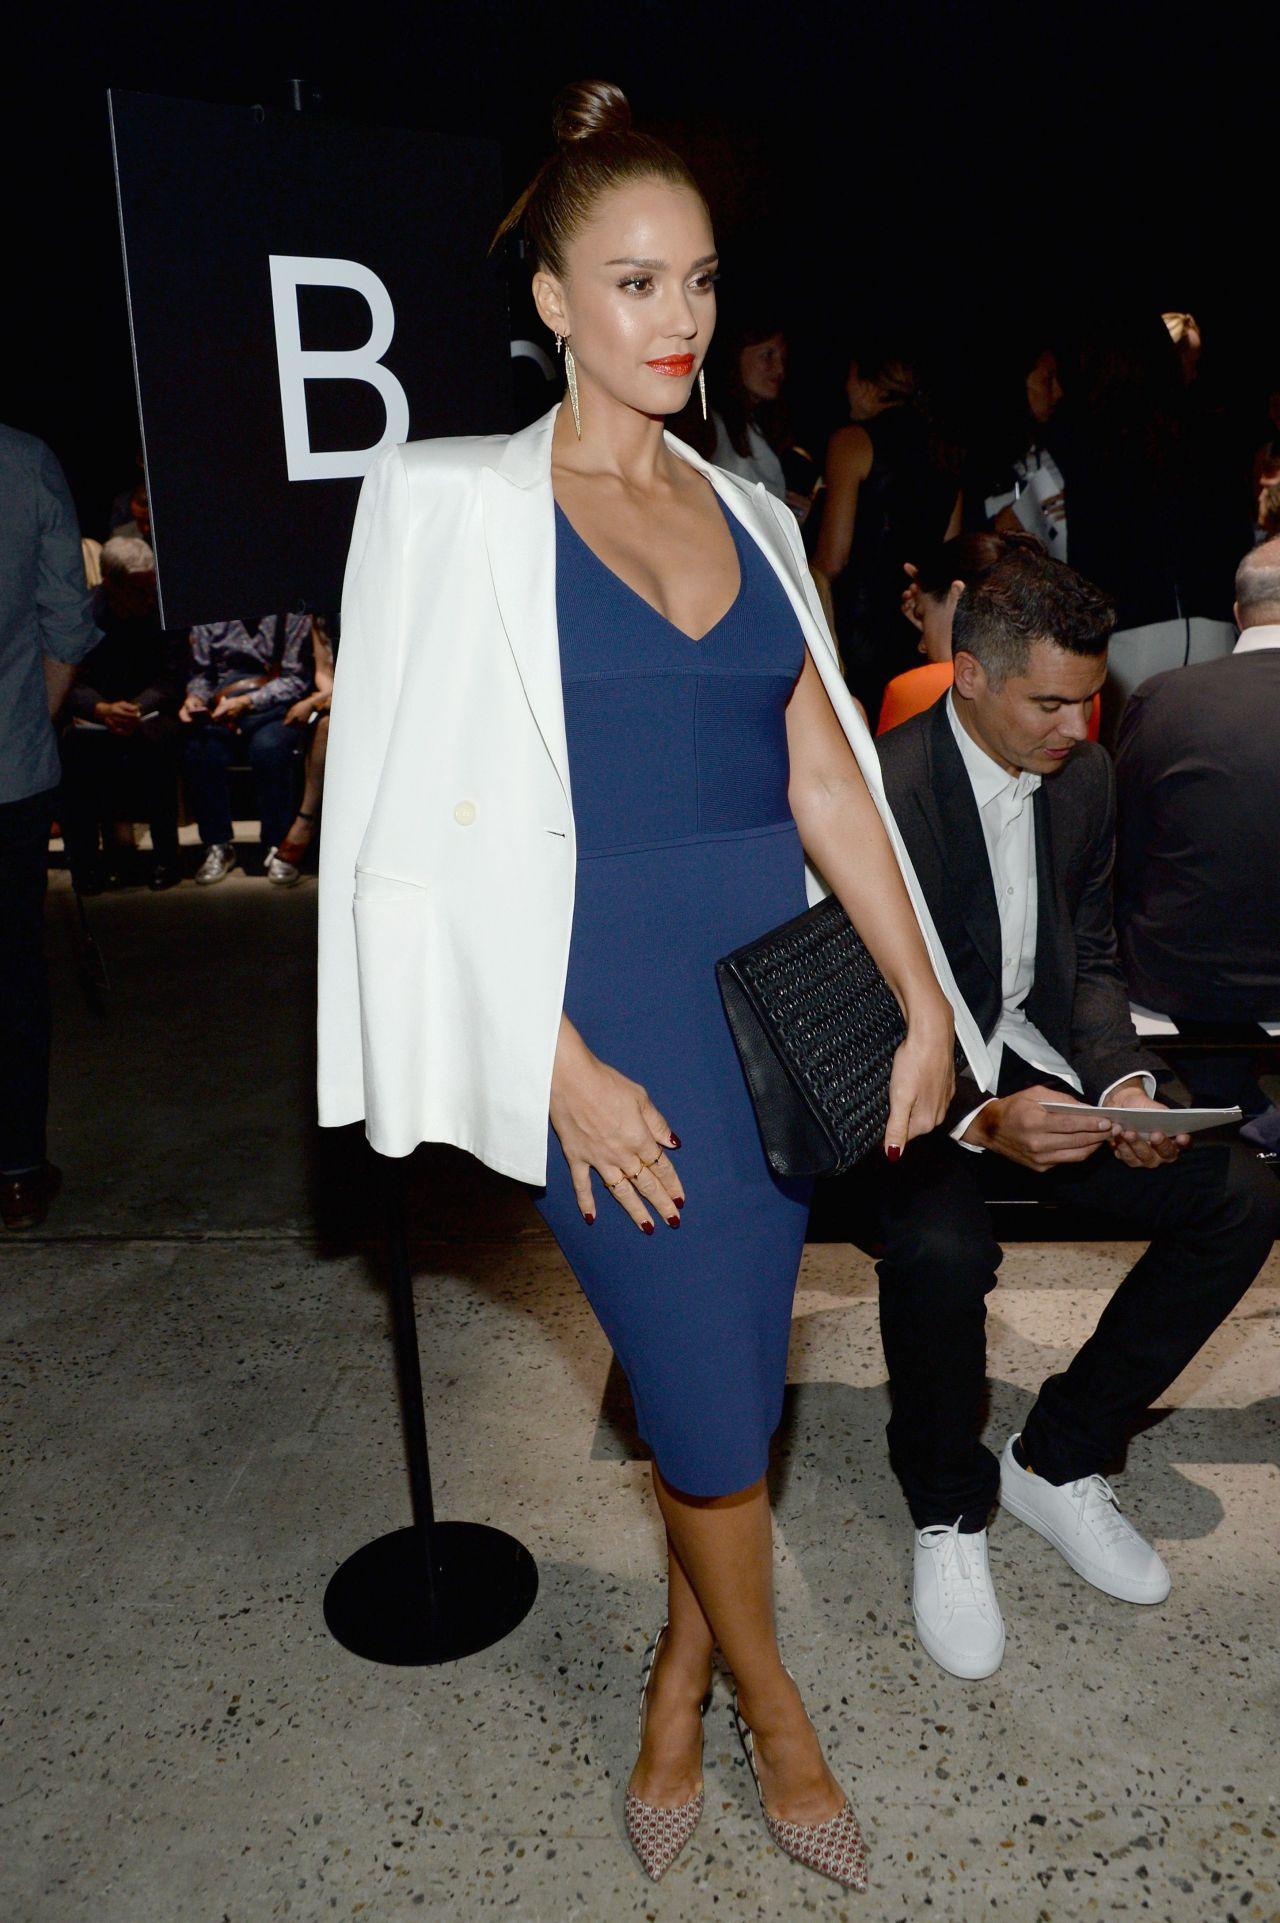 Jessica alba fashion show 40